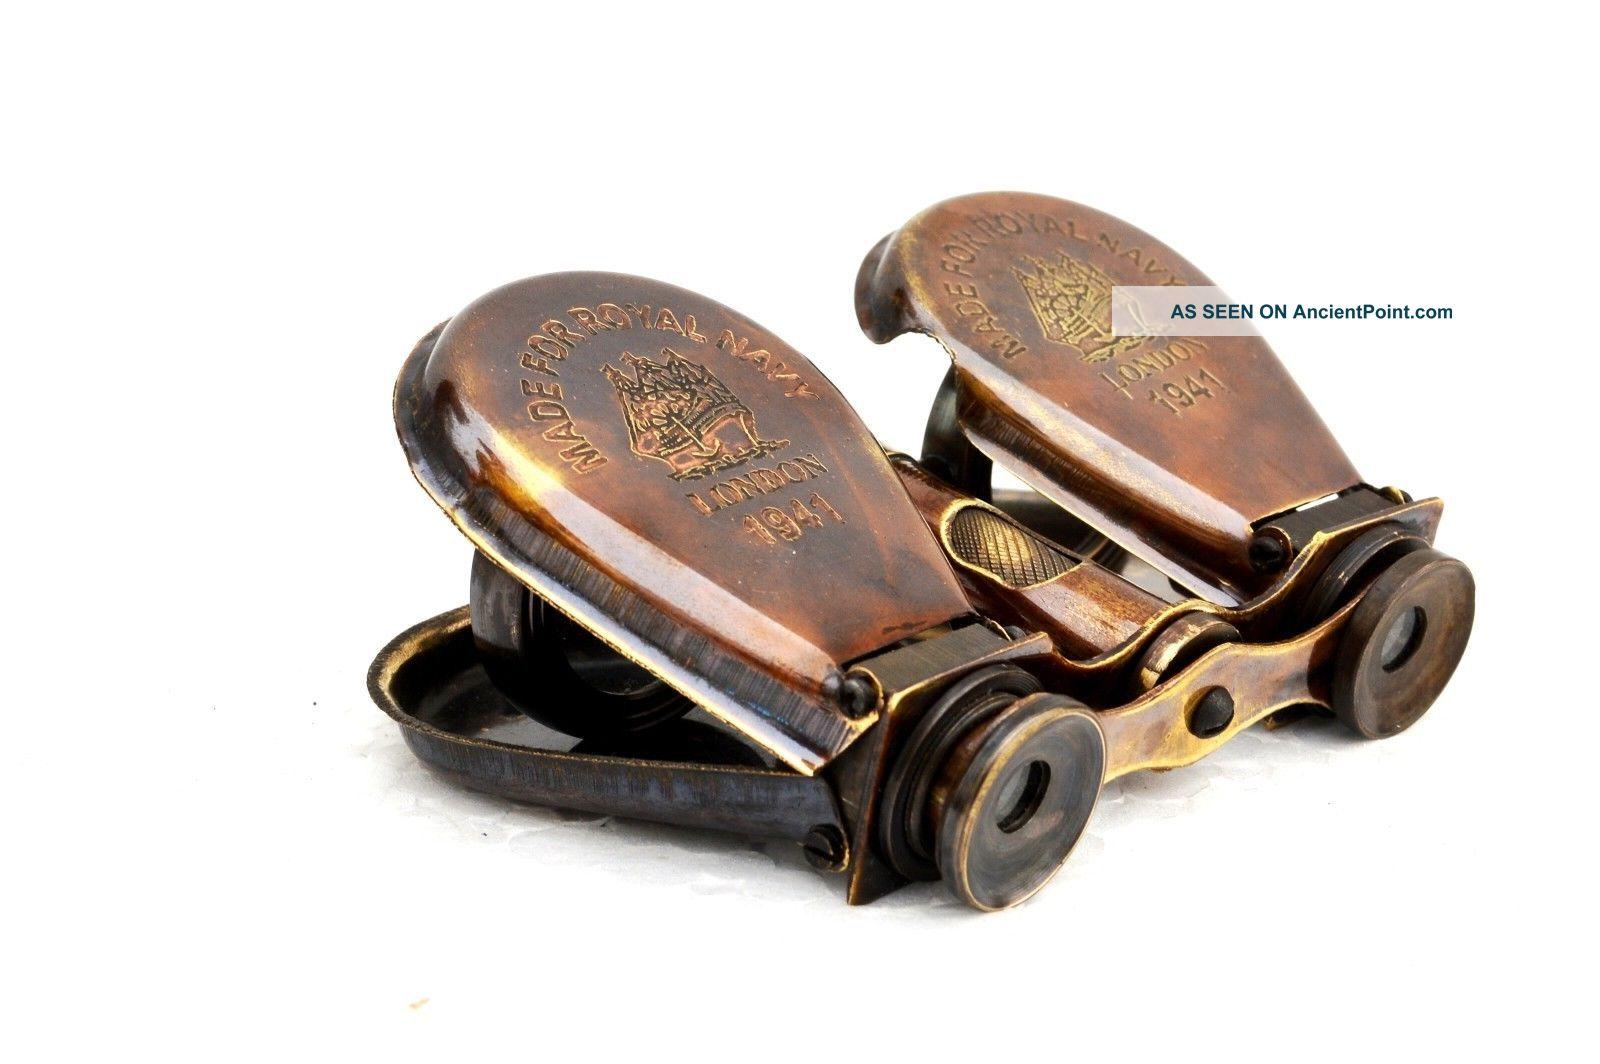 Vintage Spyglass Lens Royal Navy London 1941 Engraved Binocular Foldable,  Brass Telescopes photo